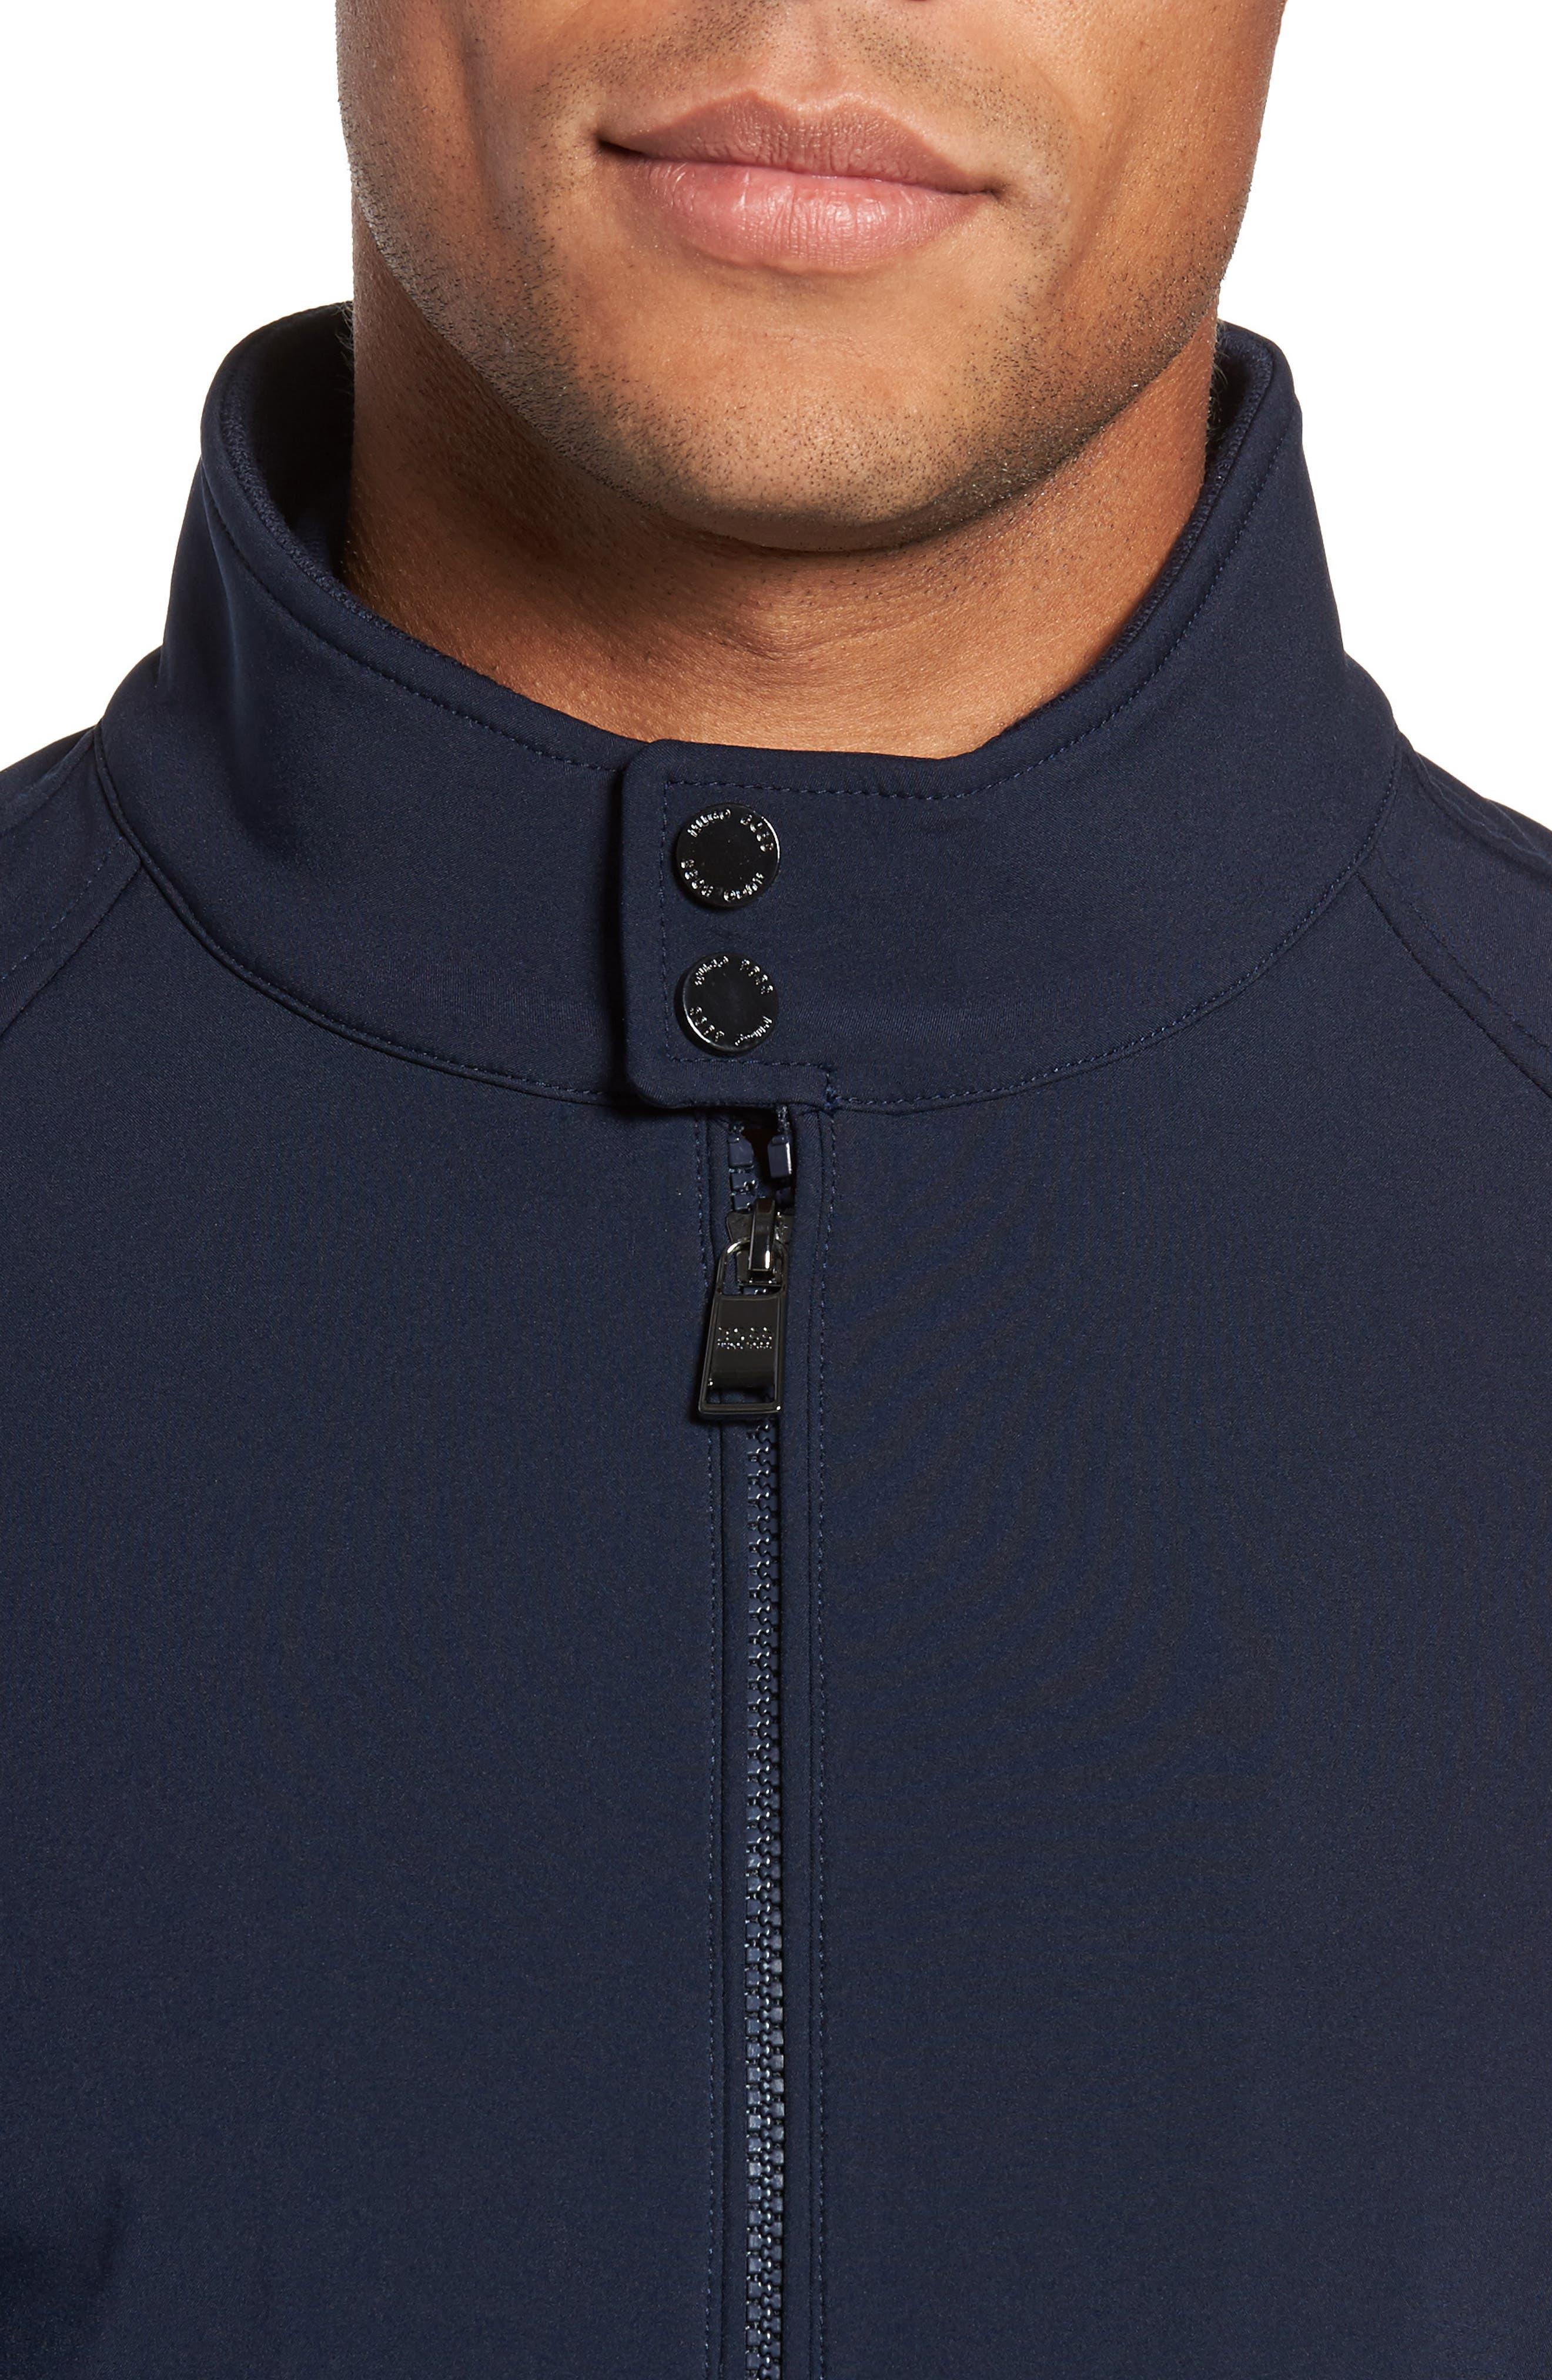 Corva Technical Jacket,                             Alternate thumbnail 4, color,                             410